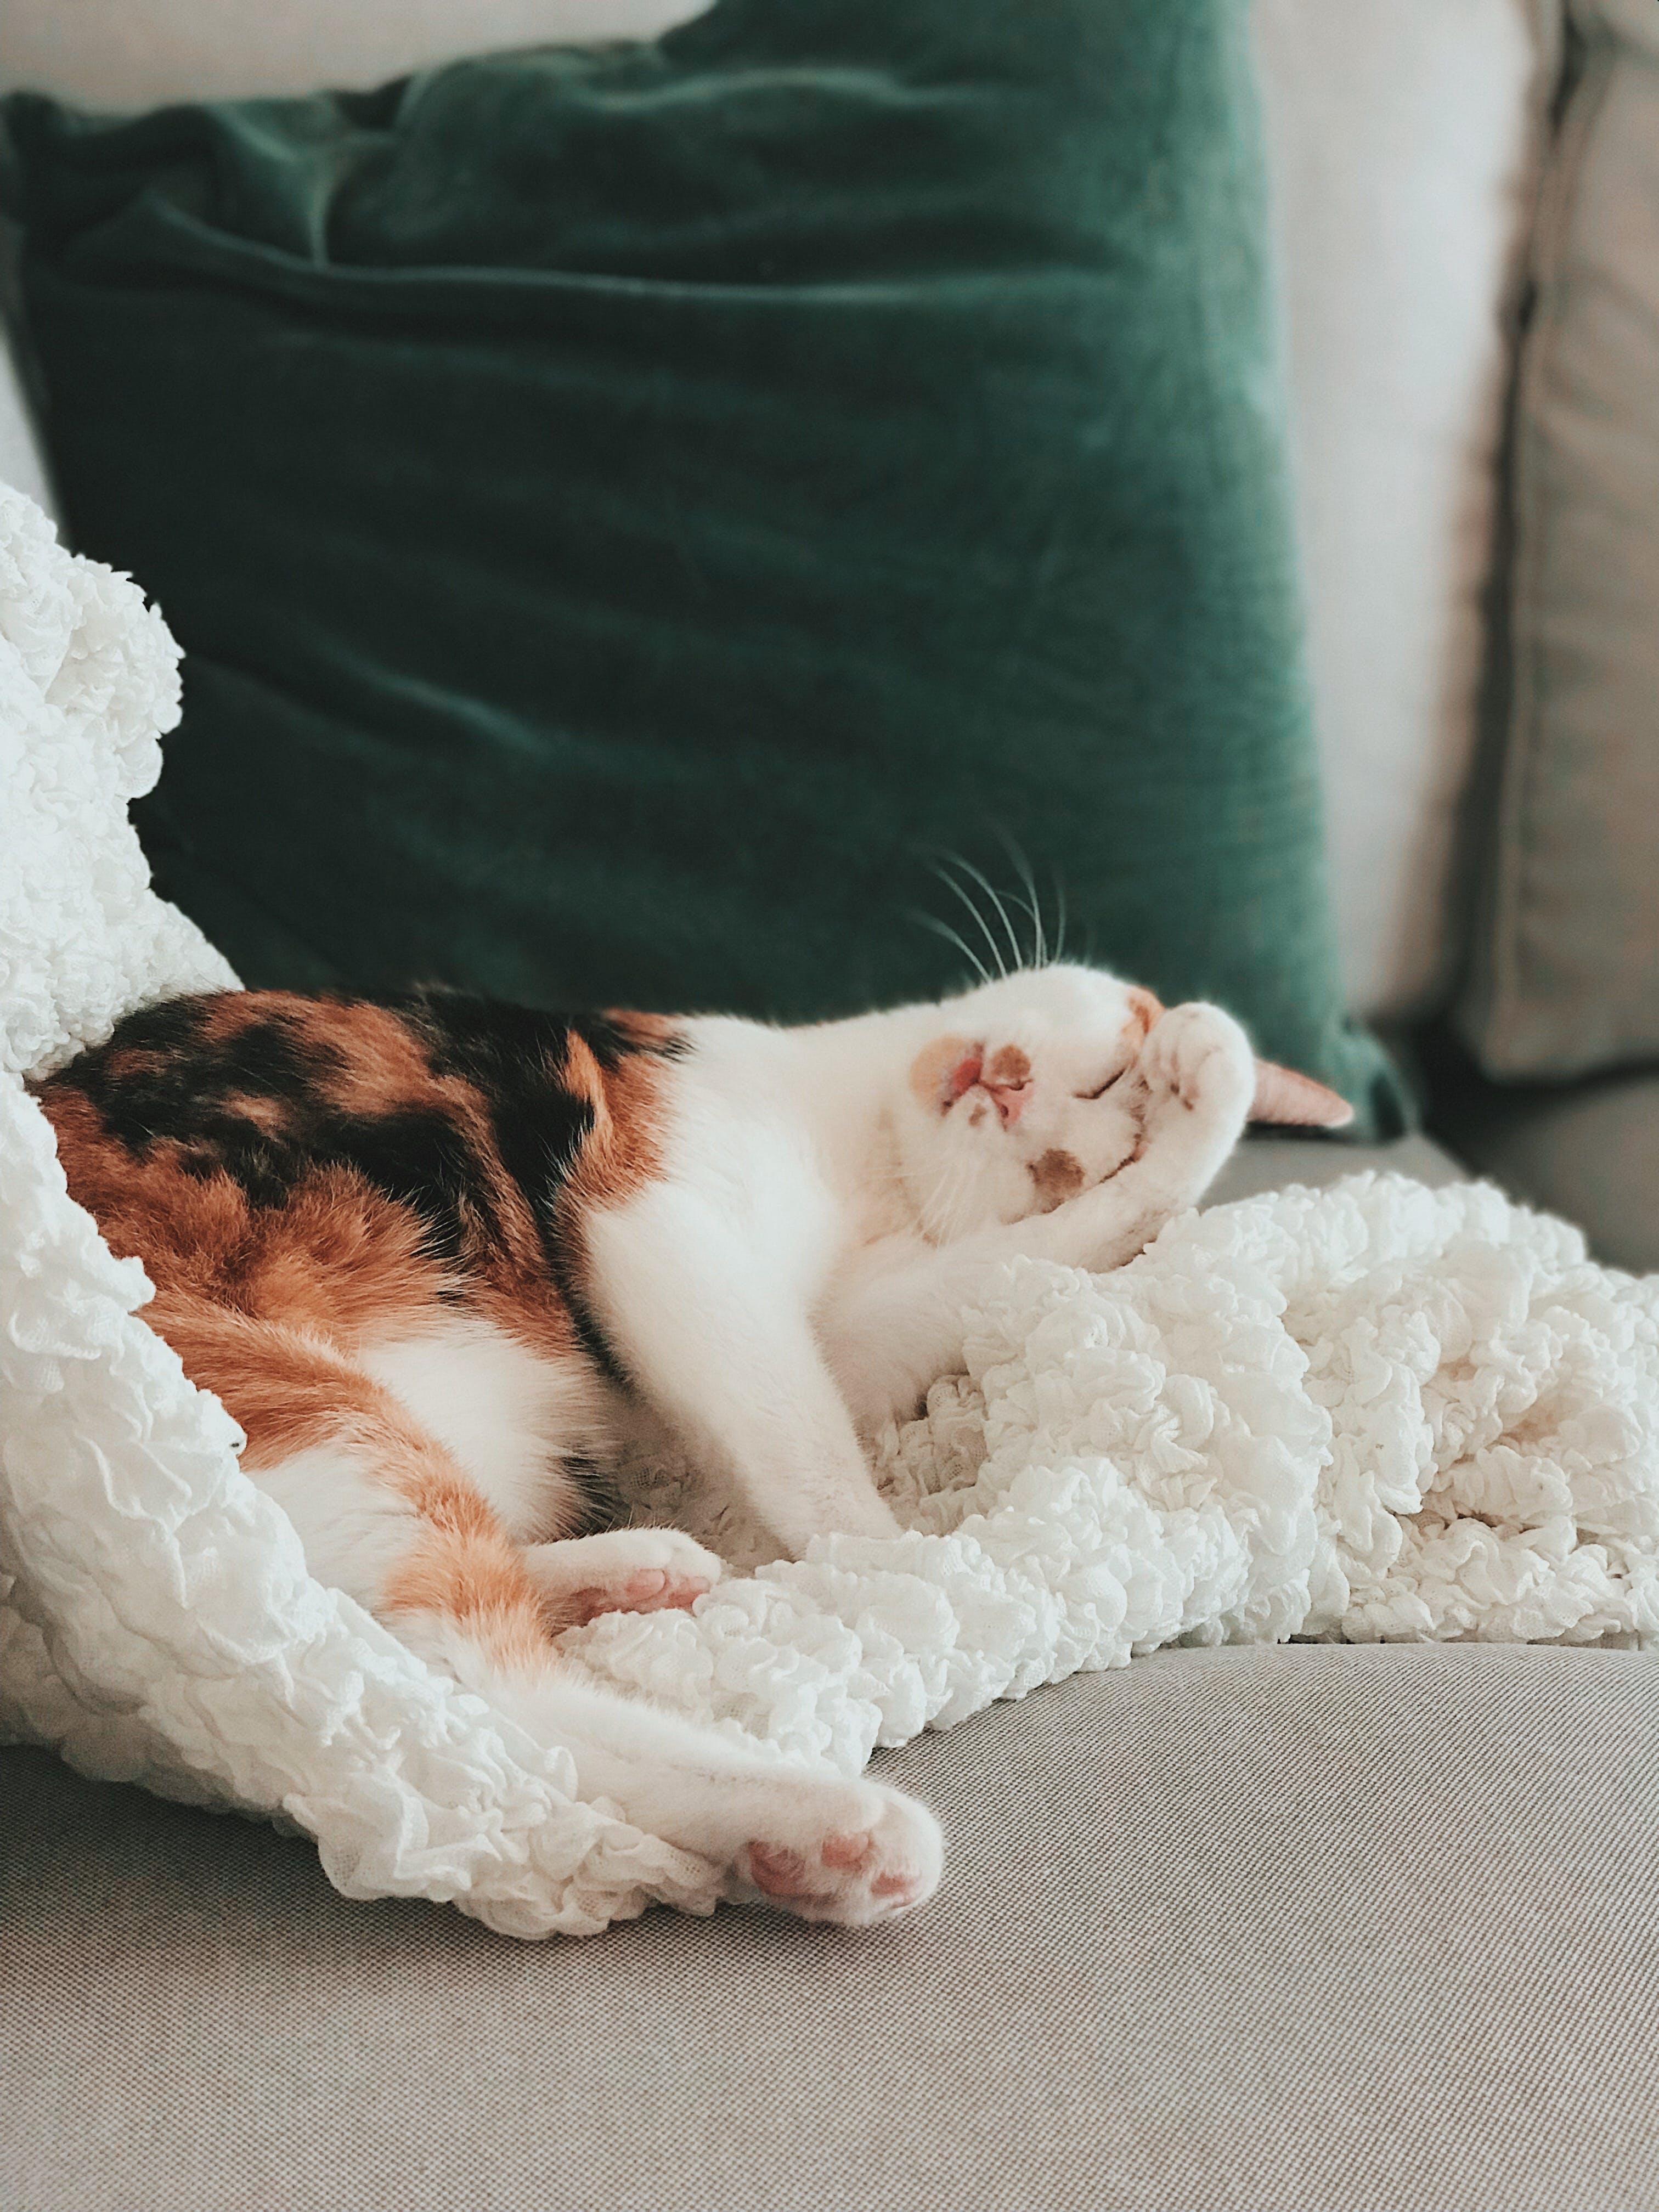 Puisi Kucing Belang Tiga. Kucing Peliharaan Kesayanganku